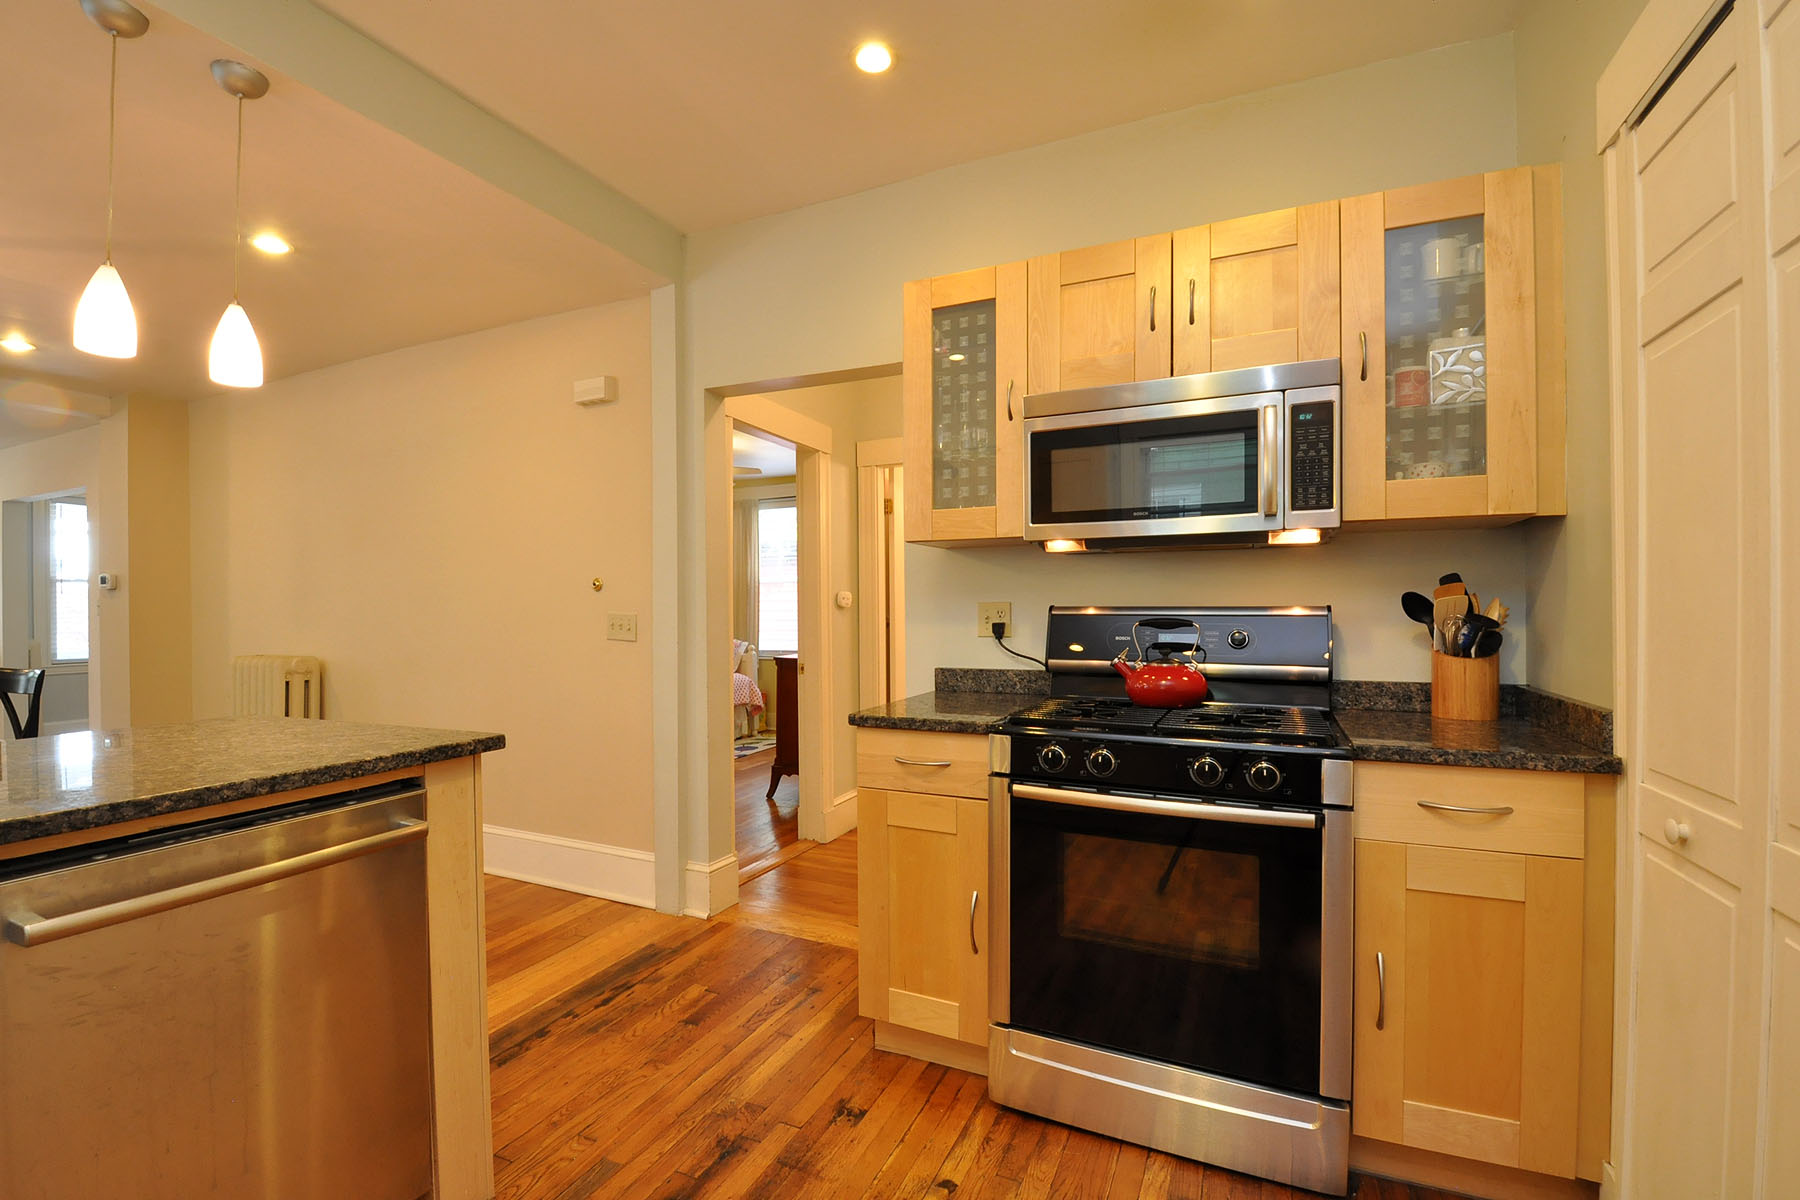 Condominium for Sale at Sunny Condo 78 Forest Hills Street Unit 1 Jamaica Plain, Boston, Massachusetts 02130 United States